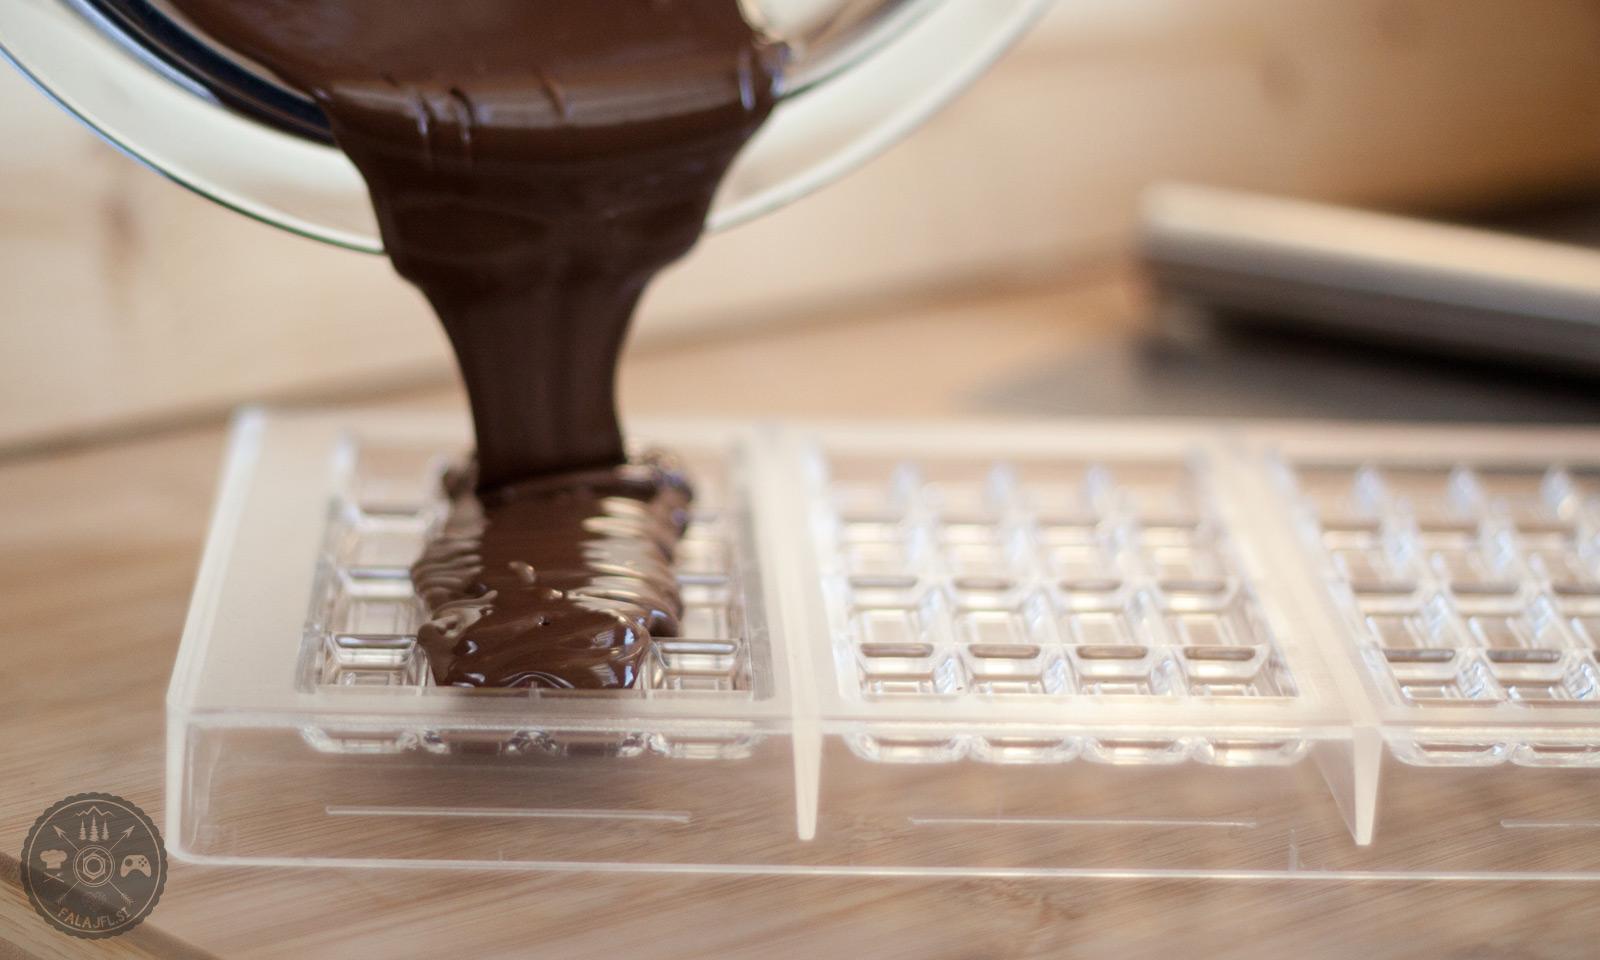 vlivanje čokolade